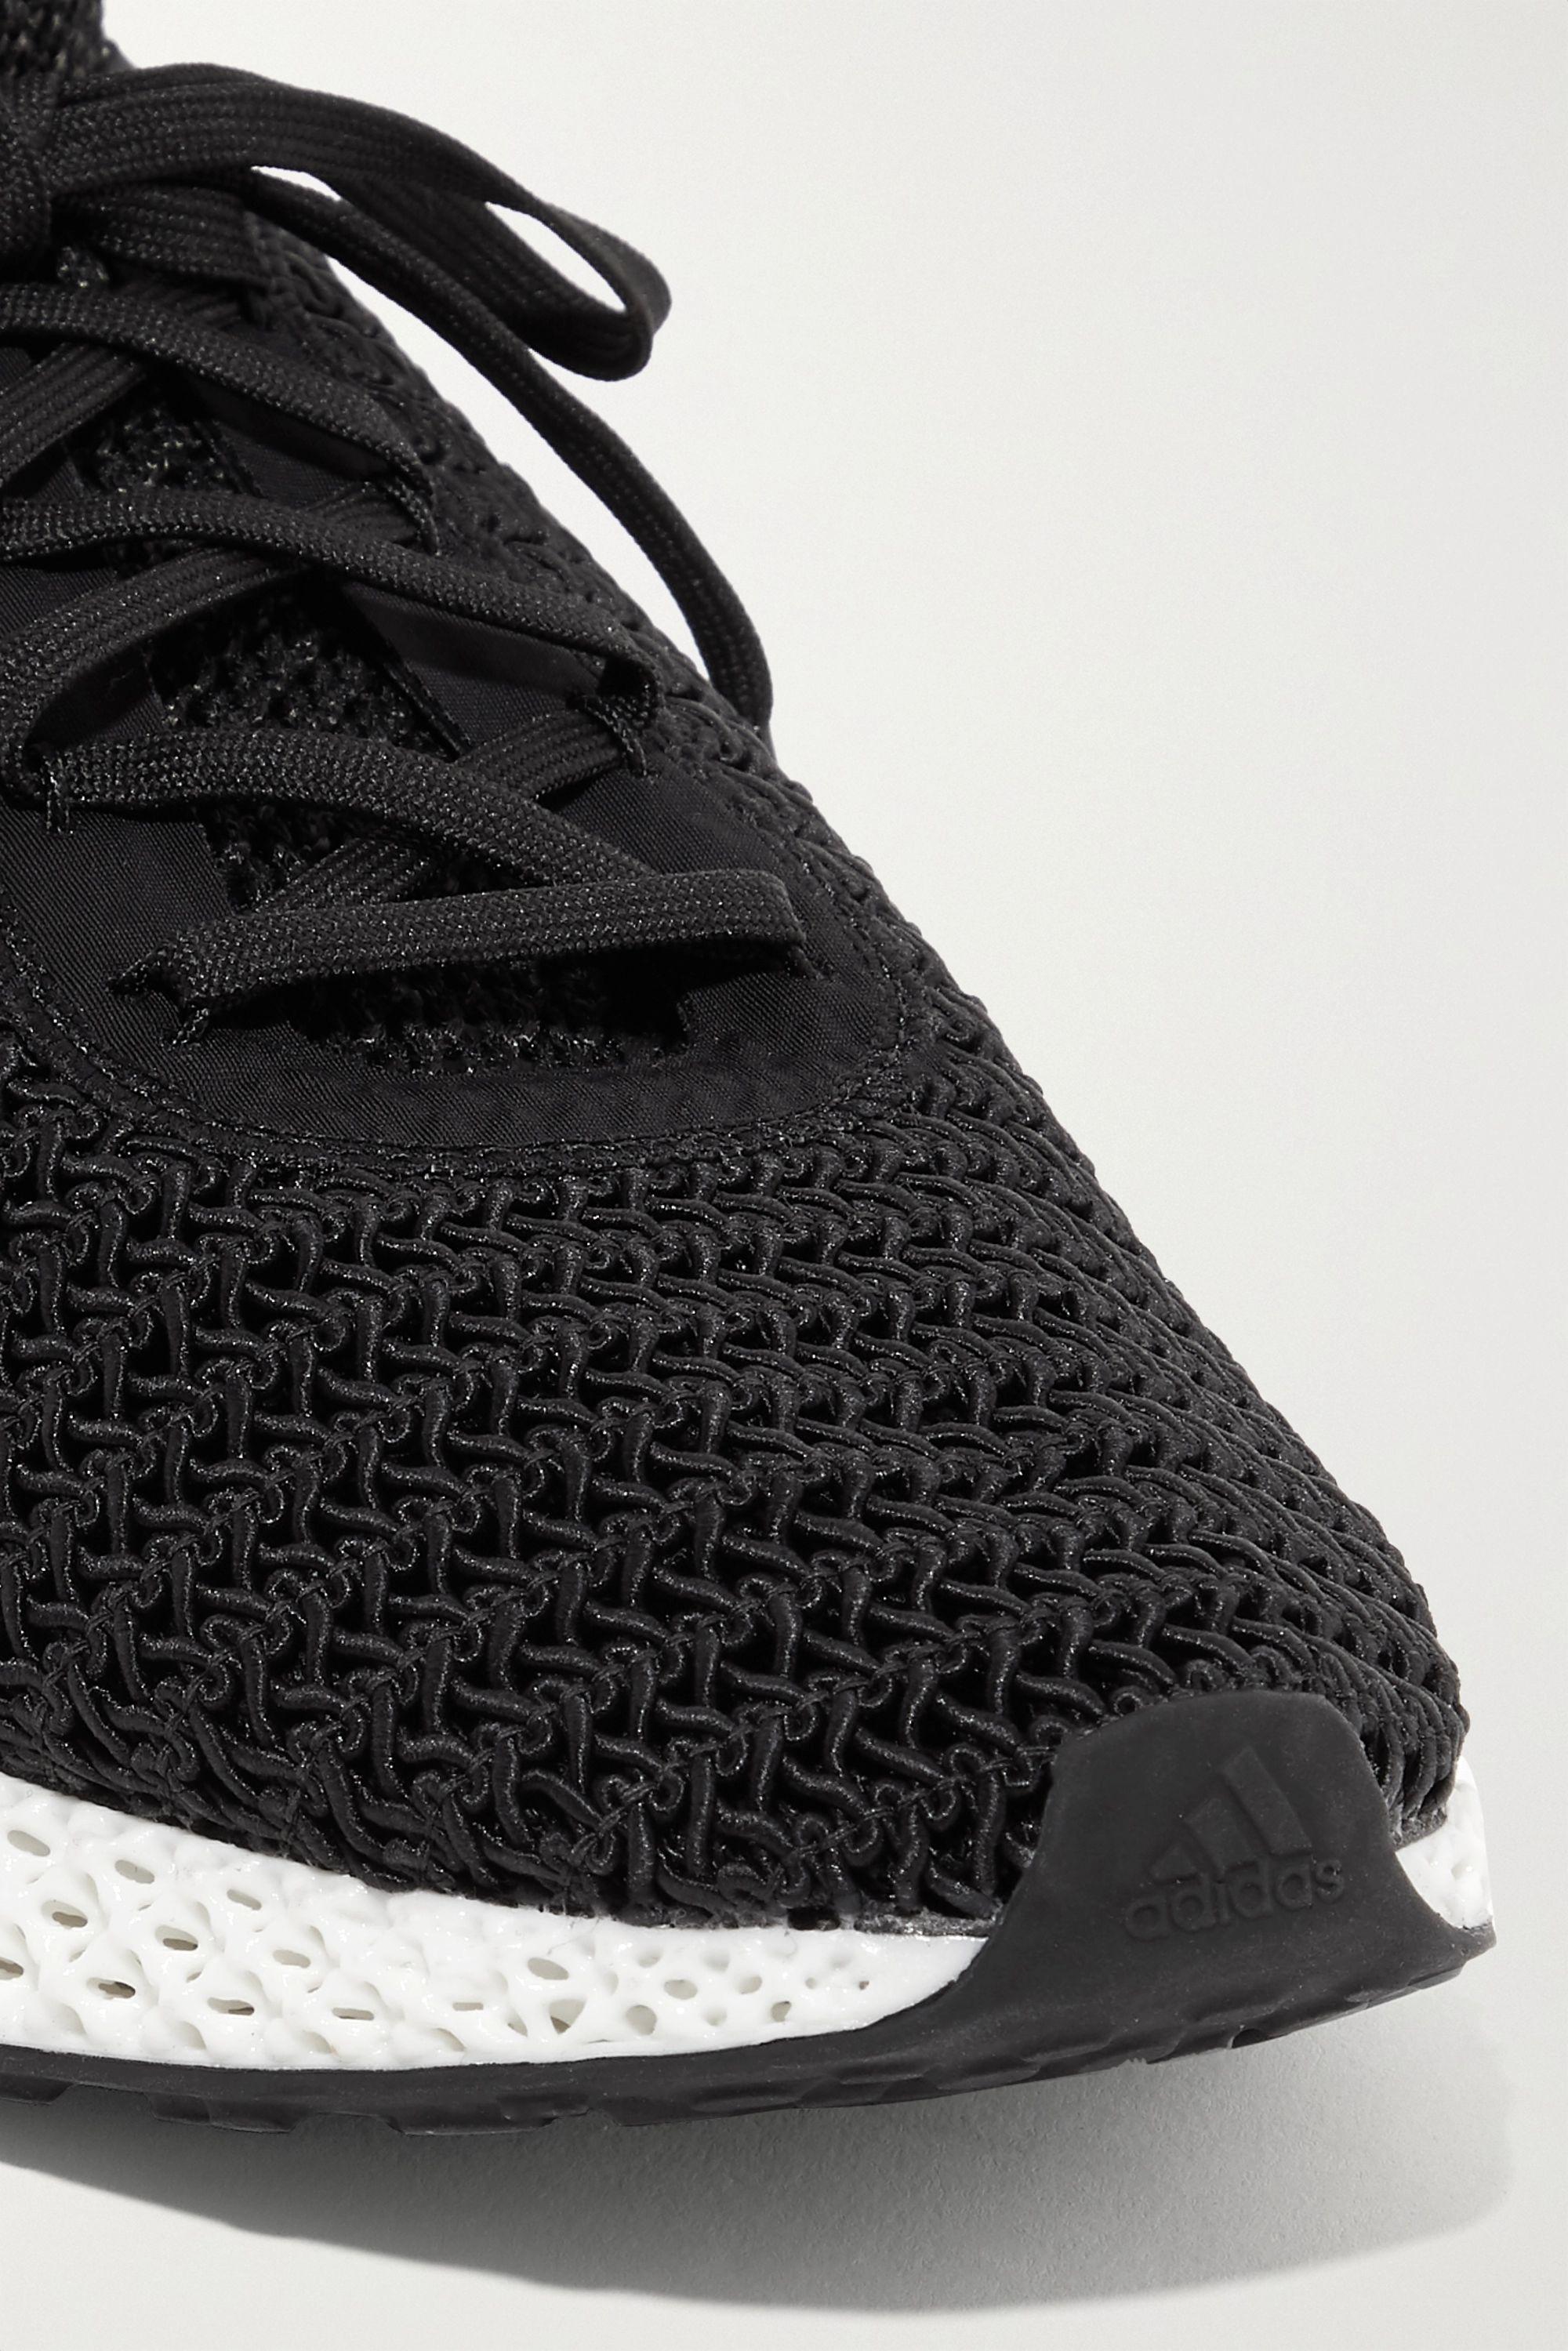 Black AlphaEdge 4D stretch-knit